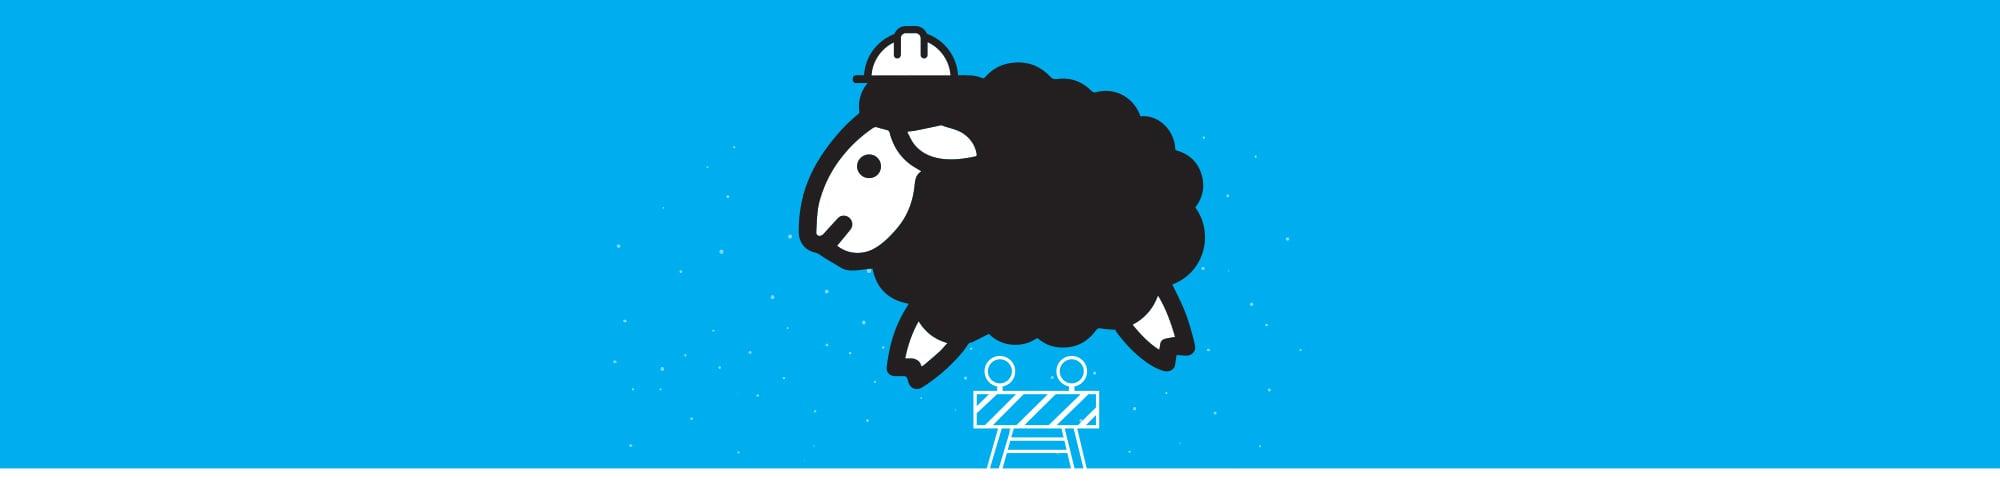 2000x500 blog header_sheep